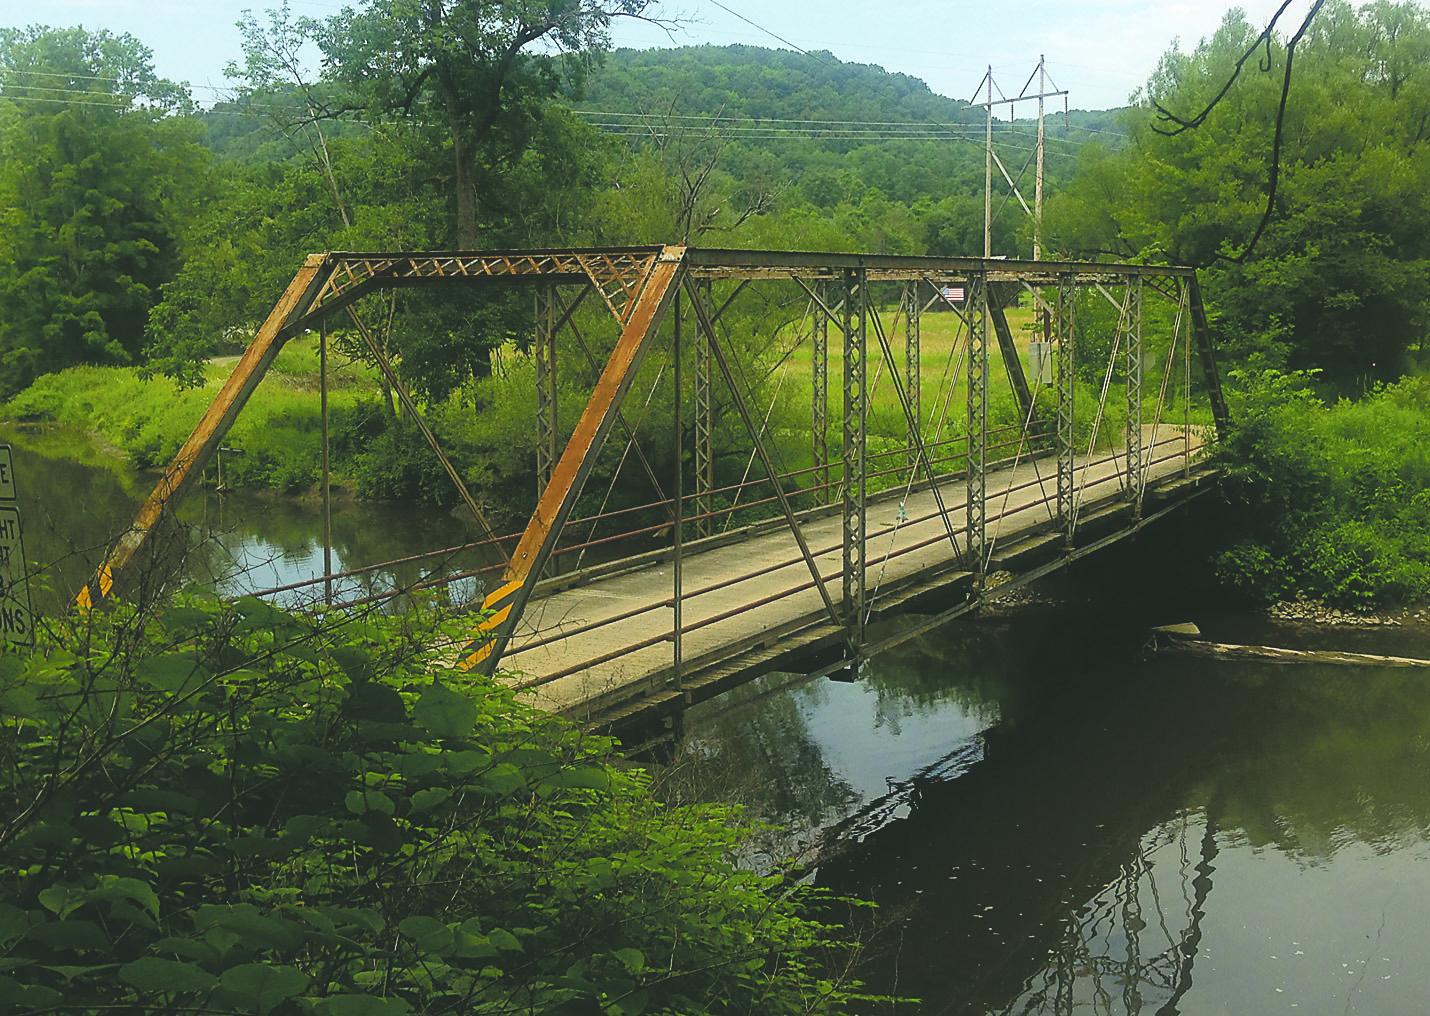 Township Of Old Bridge Building Department